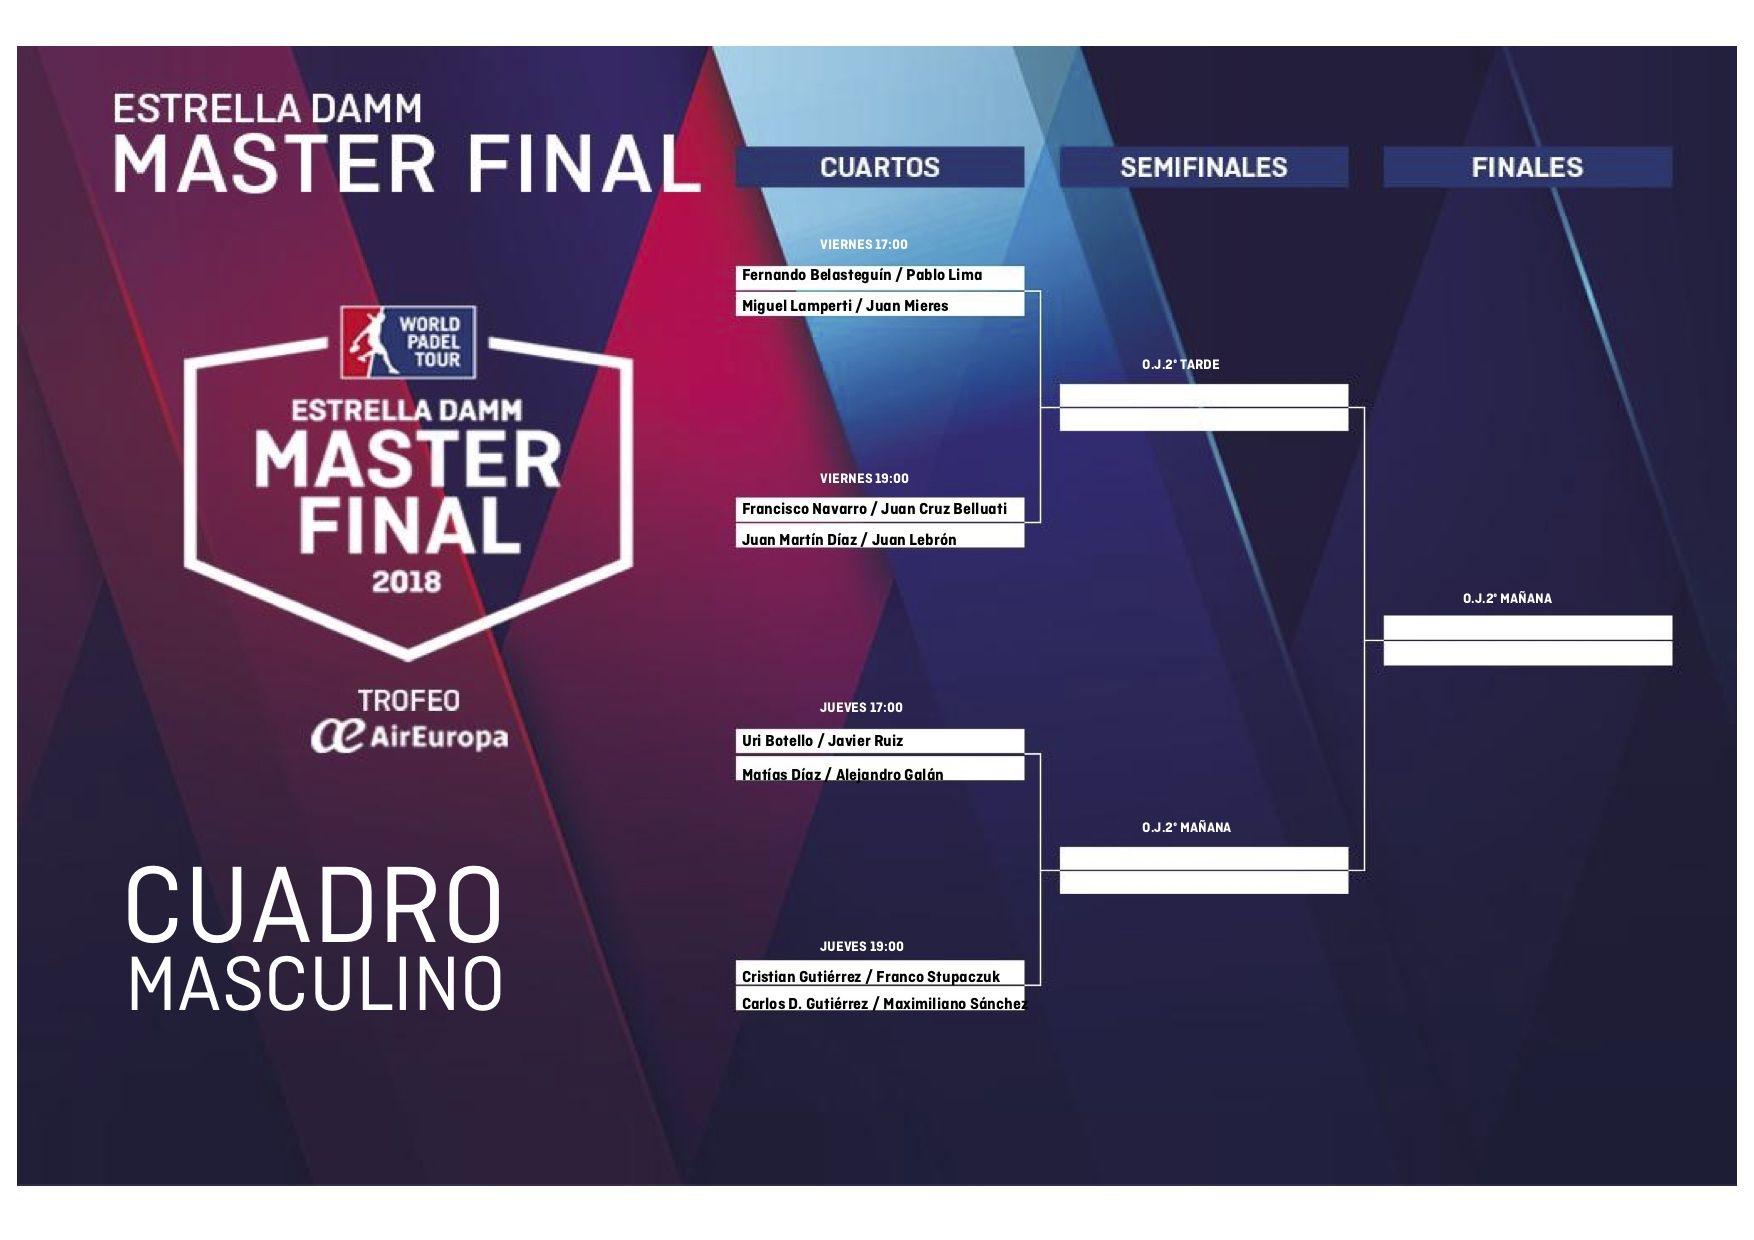 El cuadro masculino del Master Final.